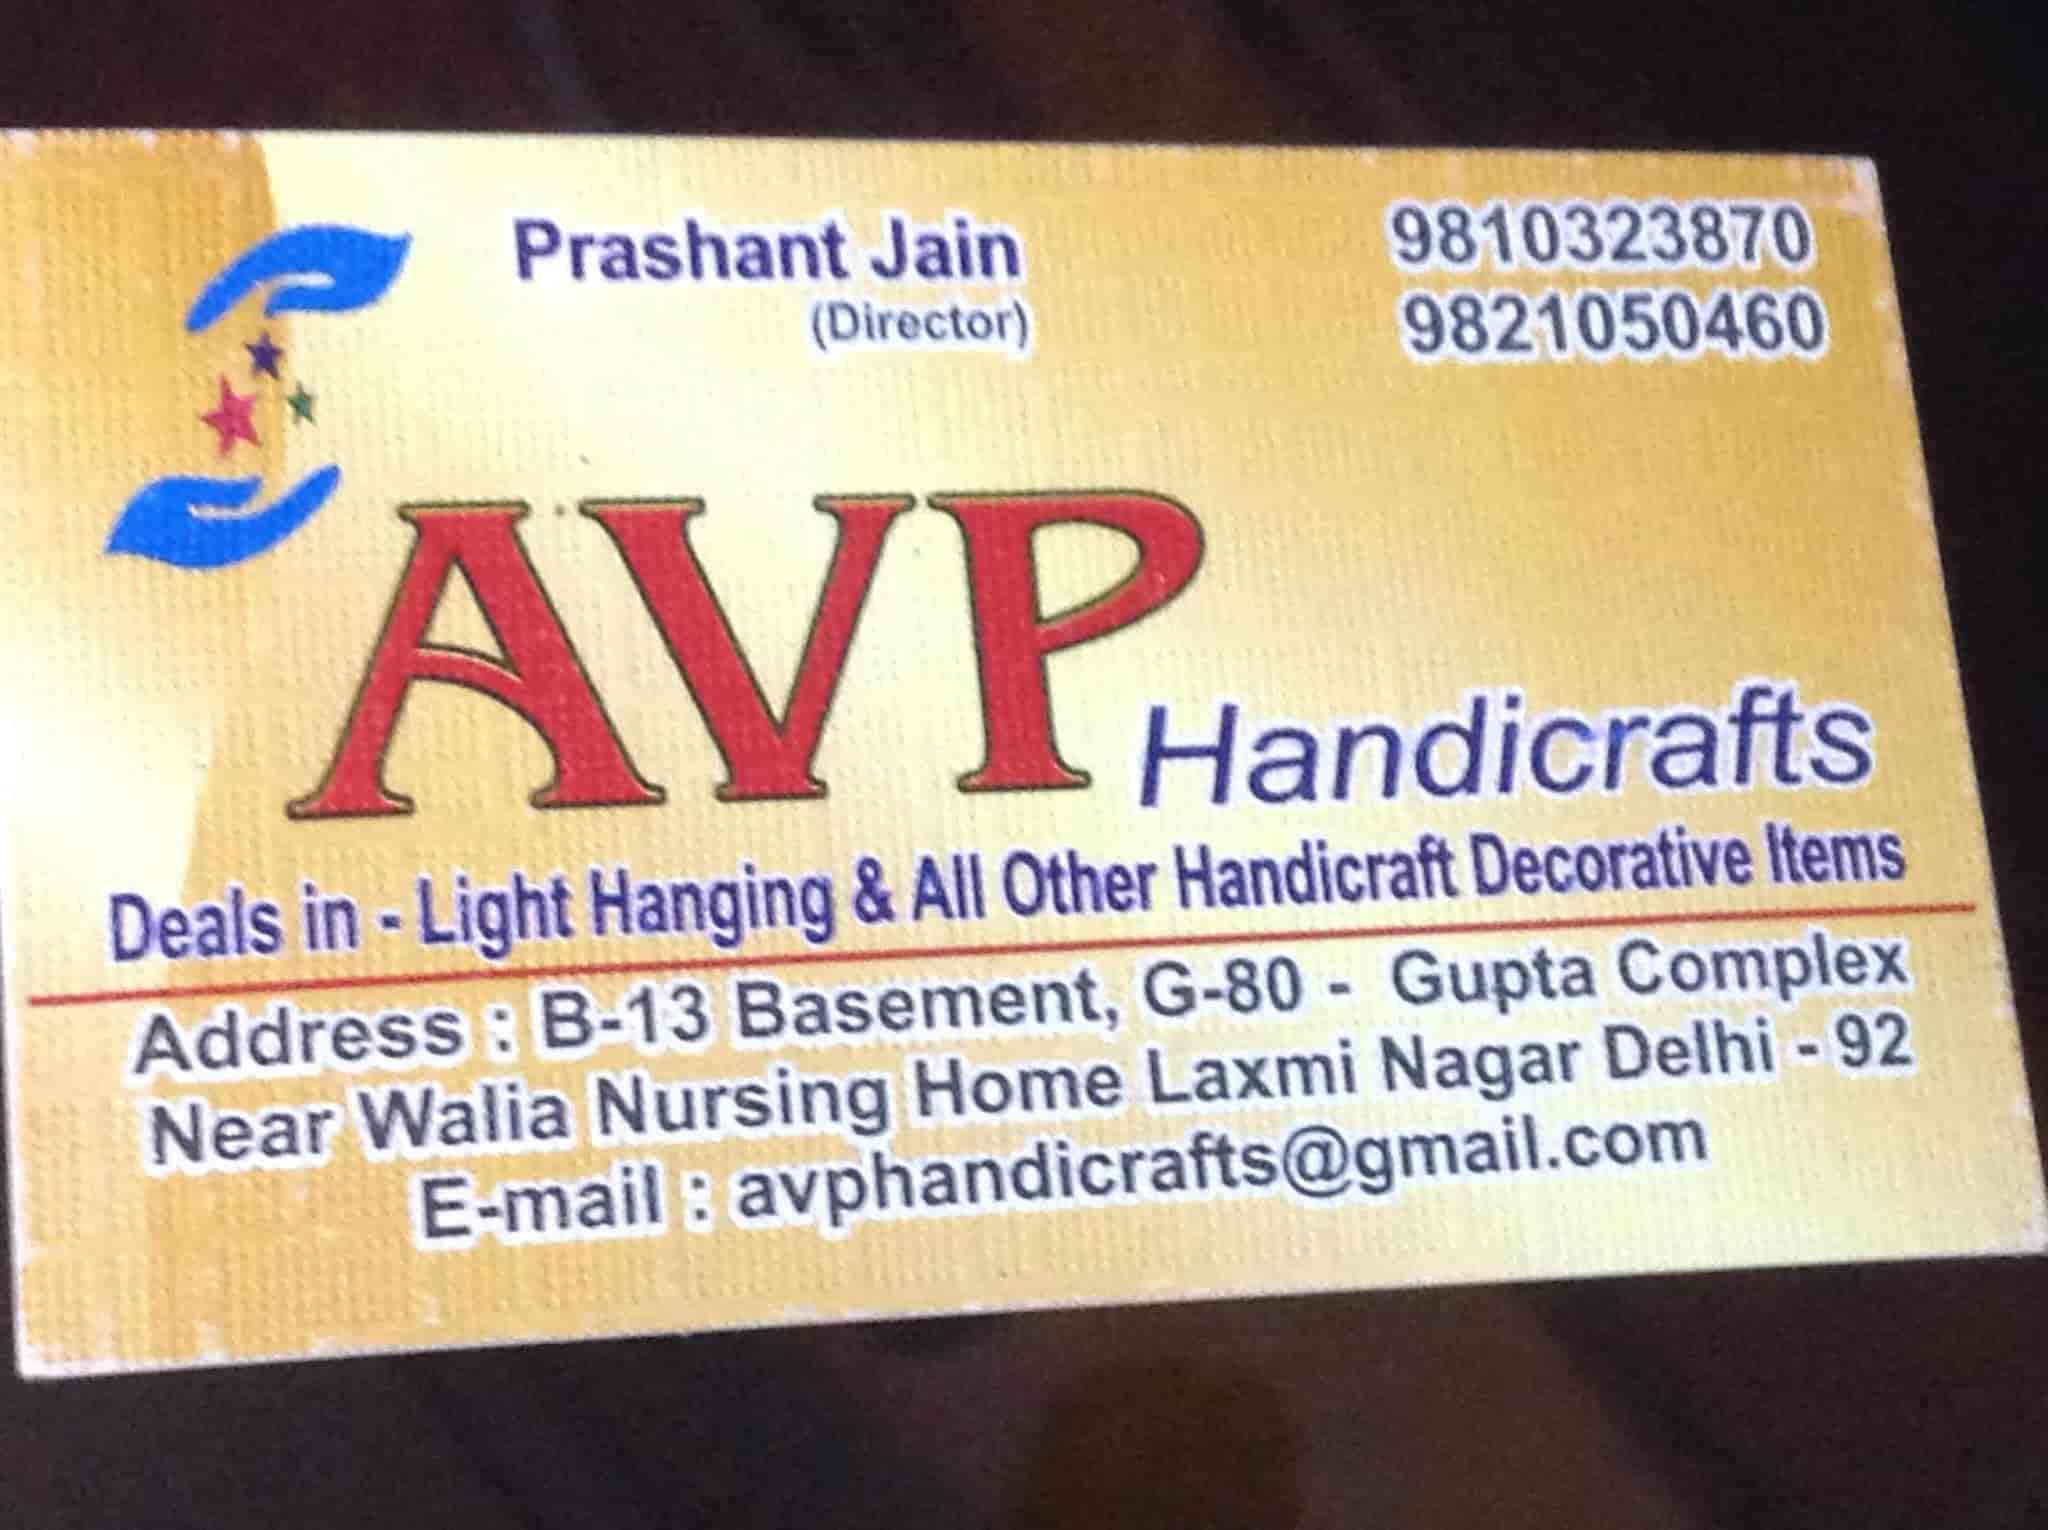 Avp Handicrafts Laxmi Nagar Handicraft Item Manufacturers In